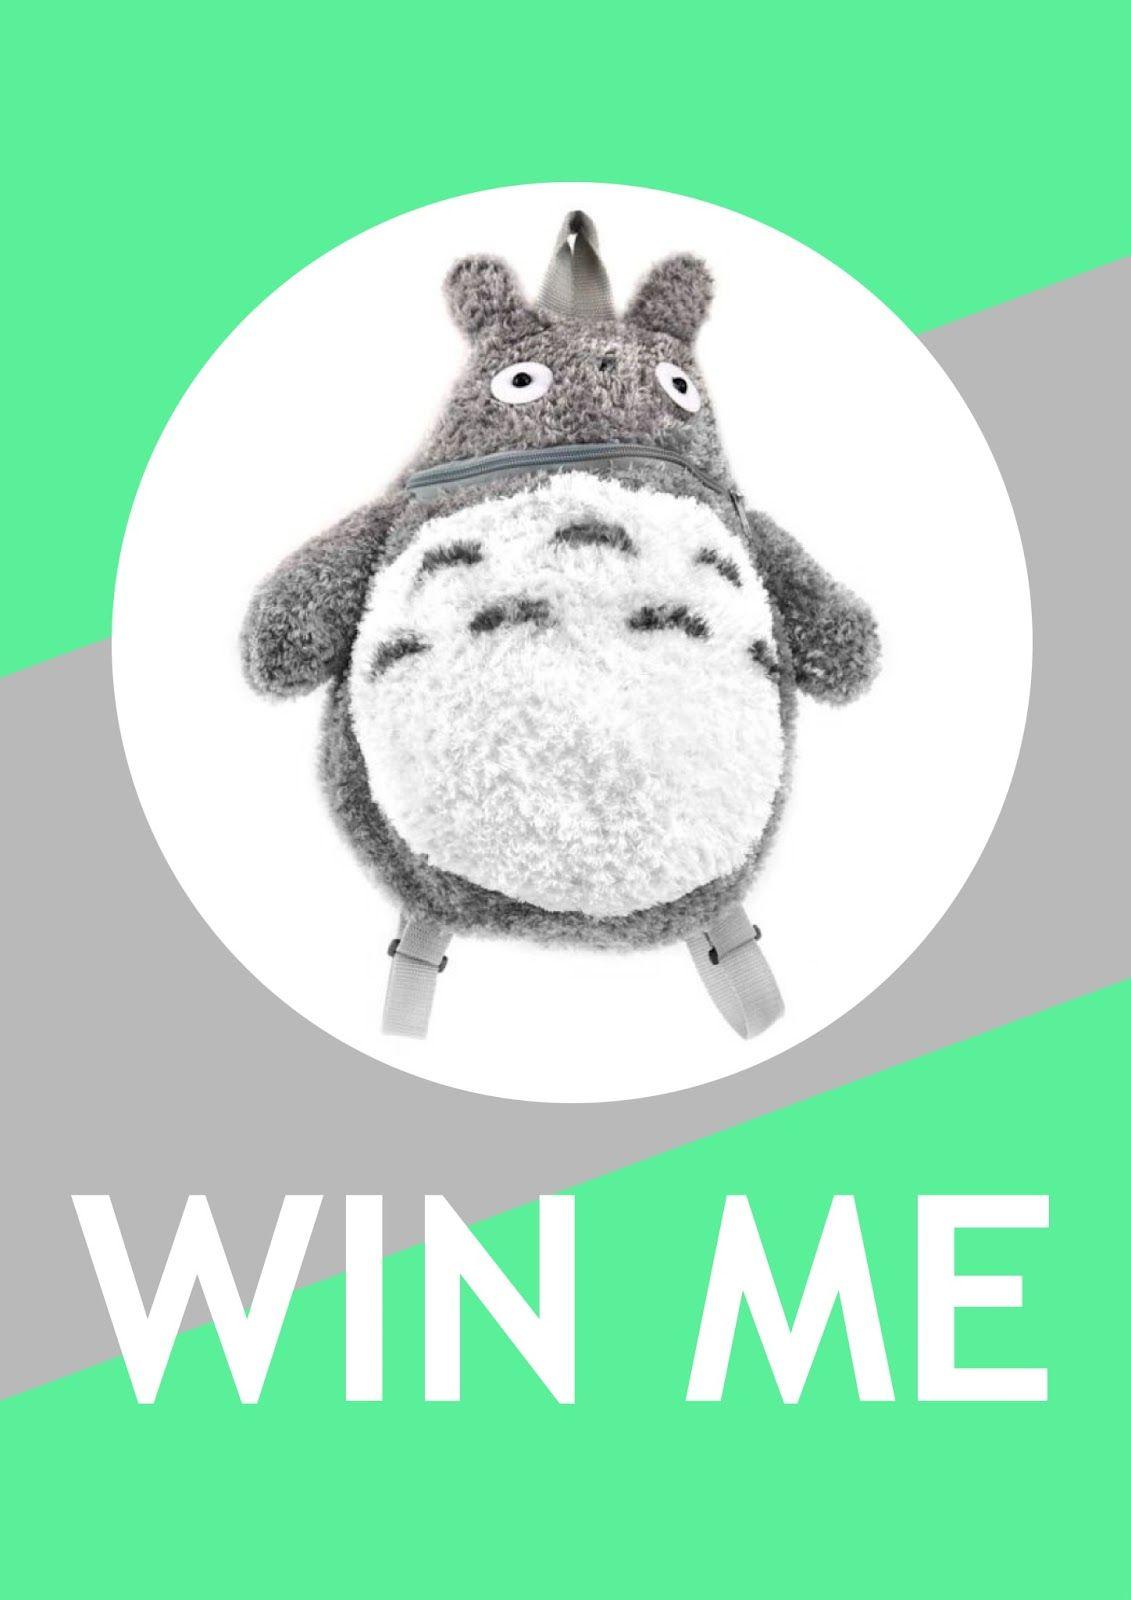 Anyone trying to win a #Totoro Plush Backpack? Enter now until 9/19! #giveaways #win #contests #kawaii #myneighbortotoro #plush #cute #japan #anime #school #kids #moms #shopping